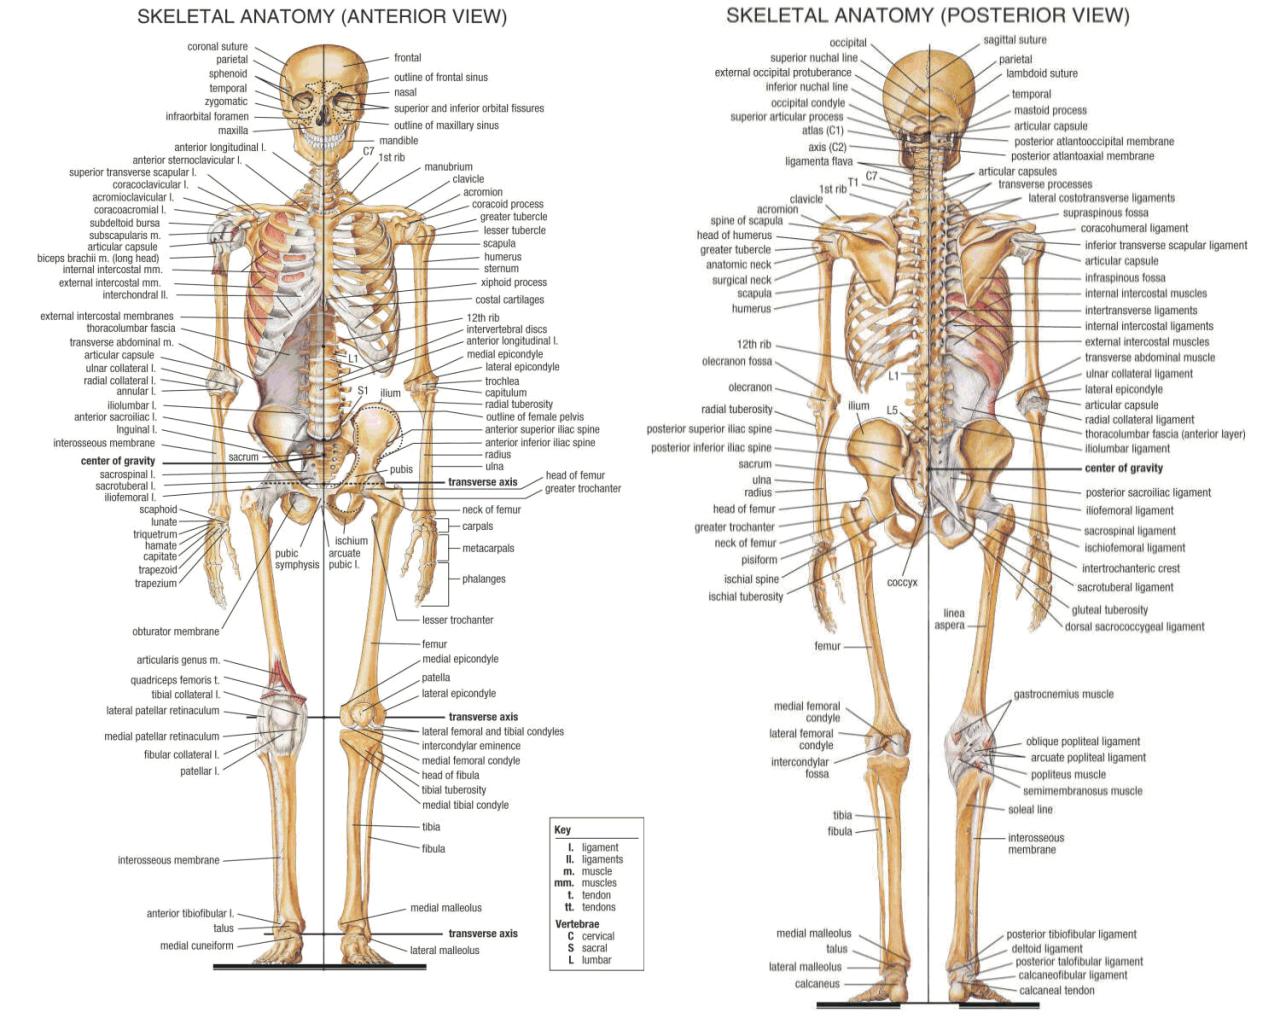 Anatomy In Motion : Photo | spandan | Pinterest | Anatomy